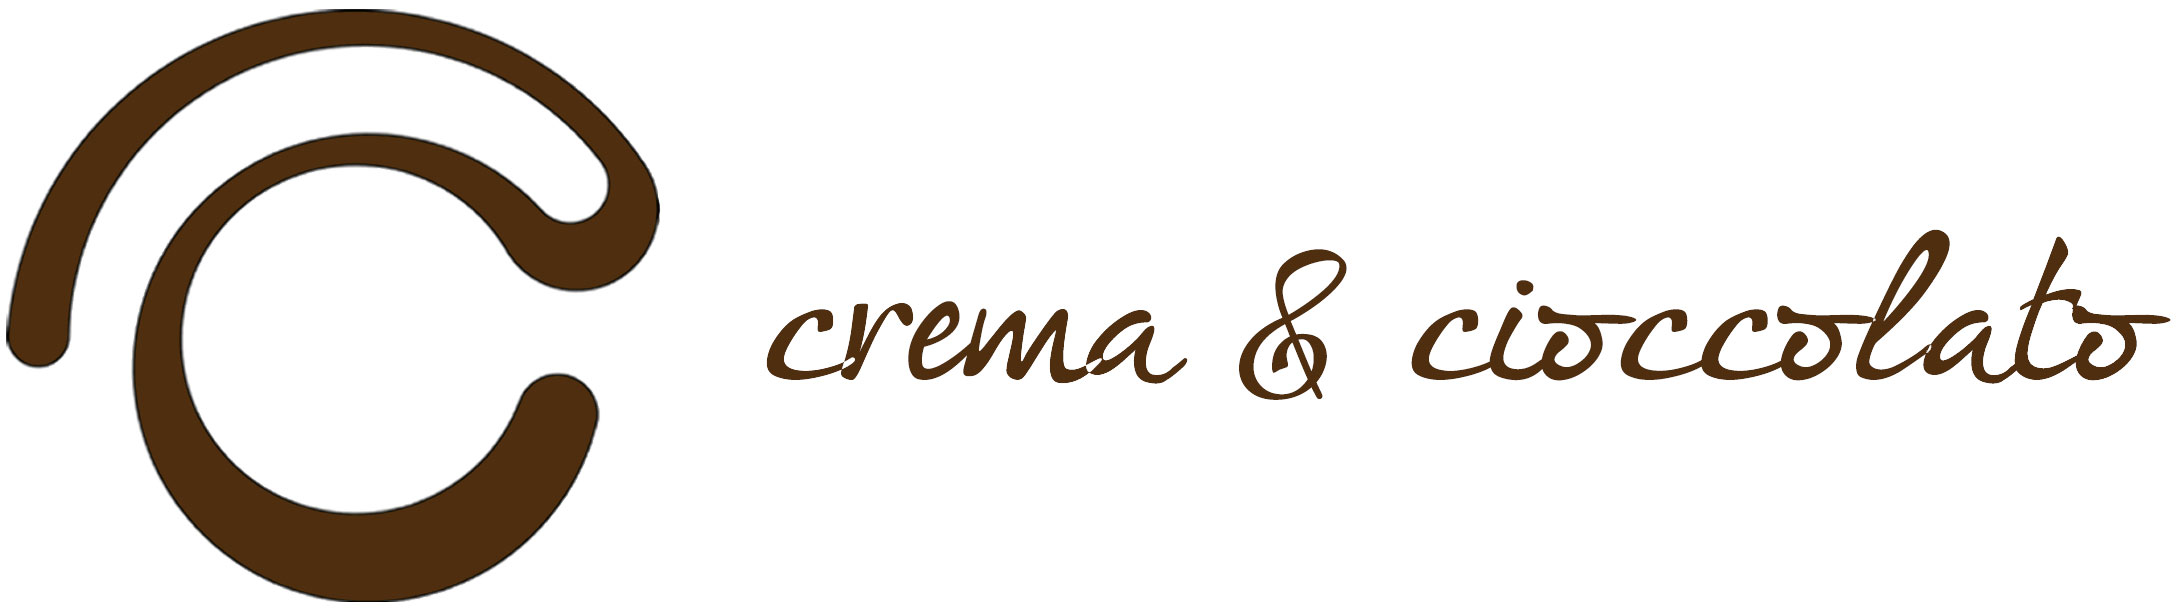 Crema & Cioccolato - Gelateria in franchising?